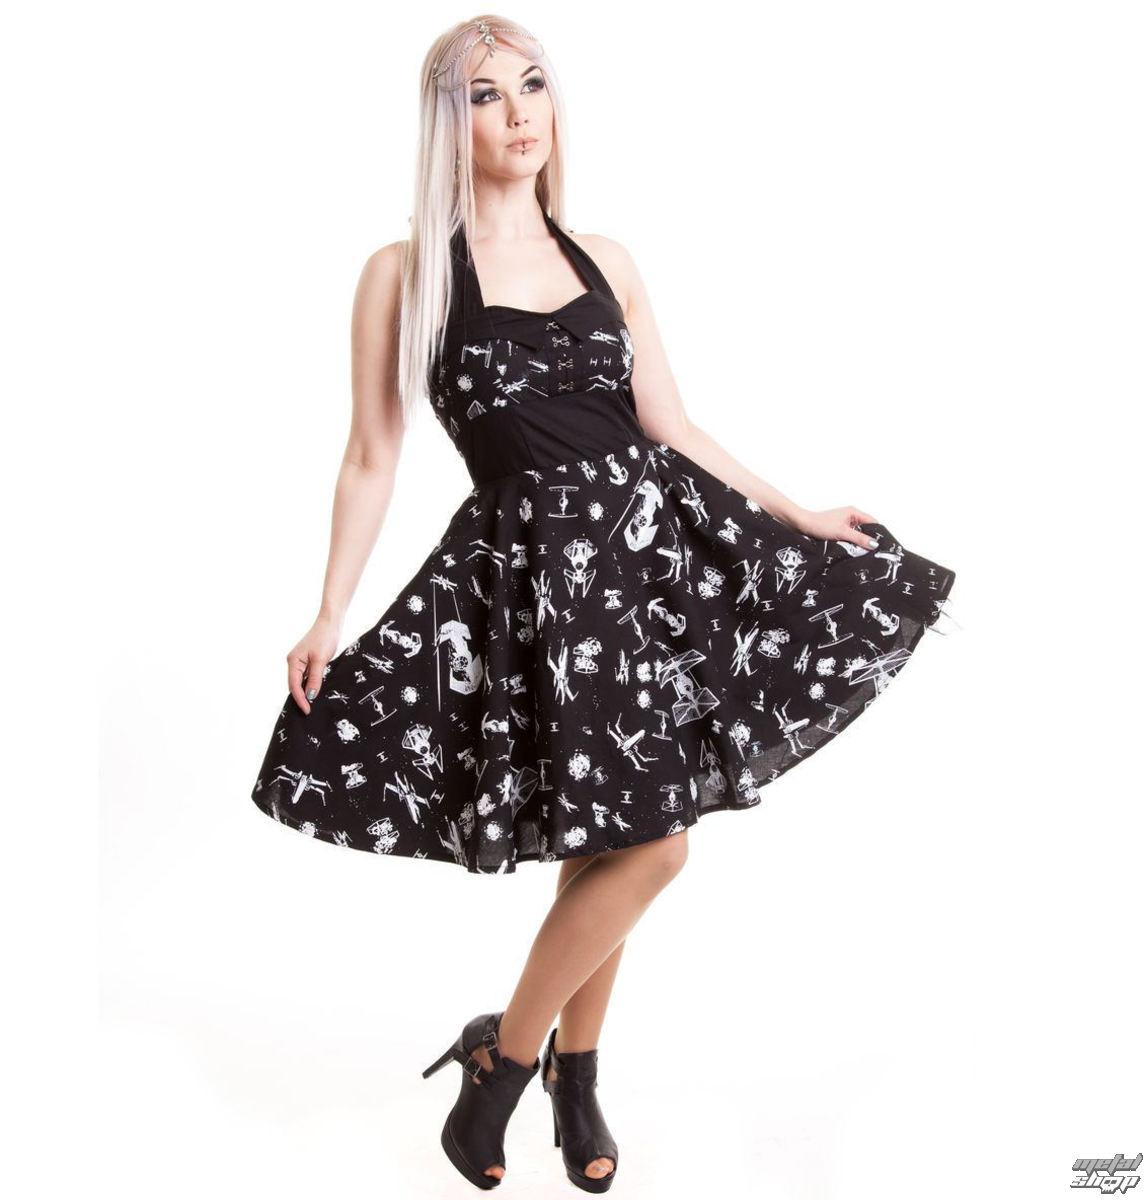 708adc93bdb2 šaty dámské DISNEY - STAR WARS - Empire - Black - POI095 - metalshop.cz